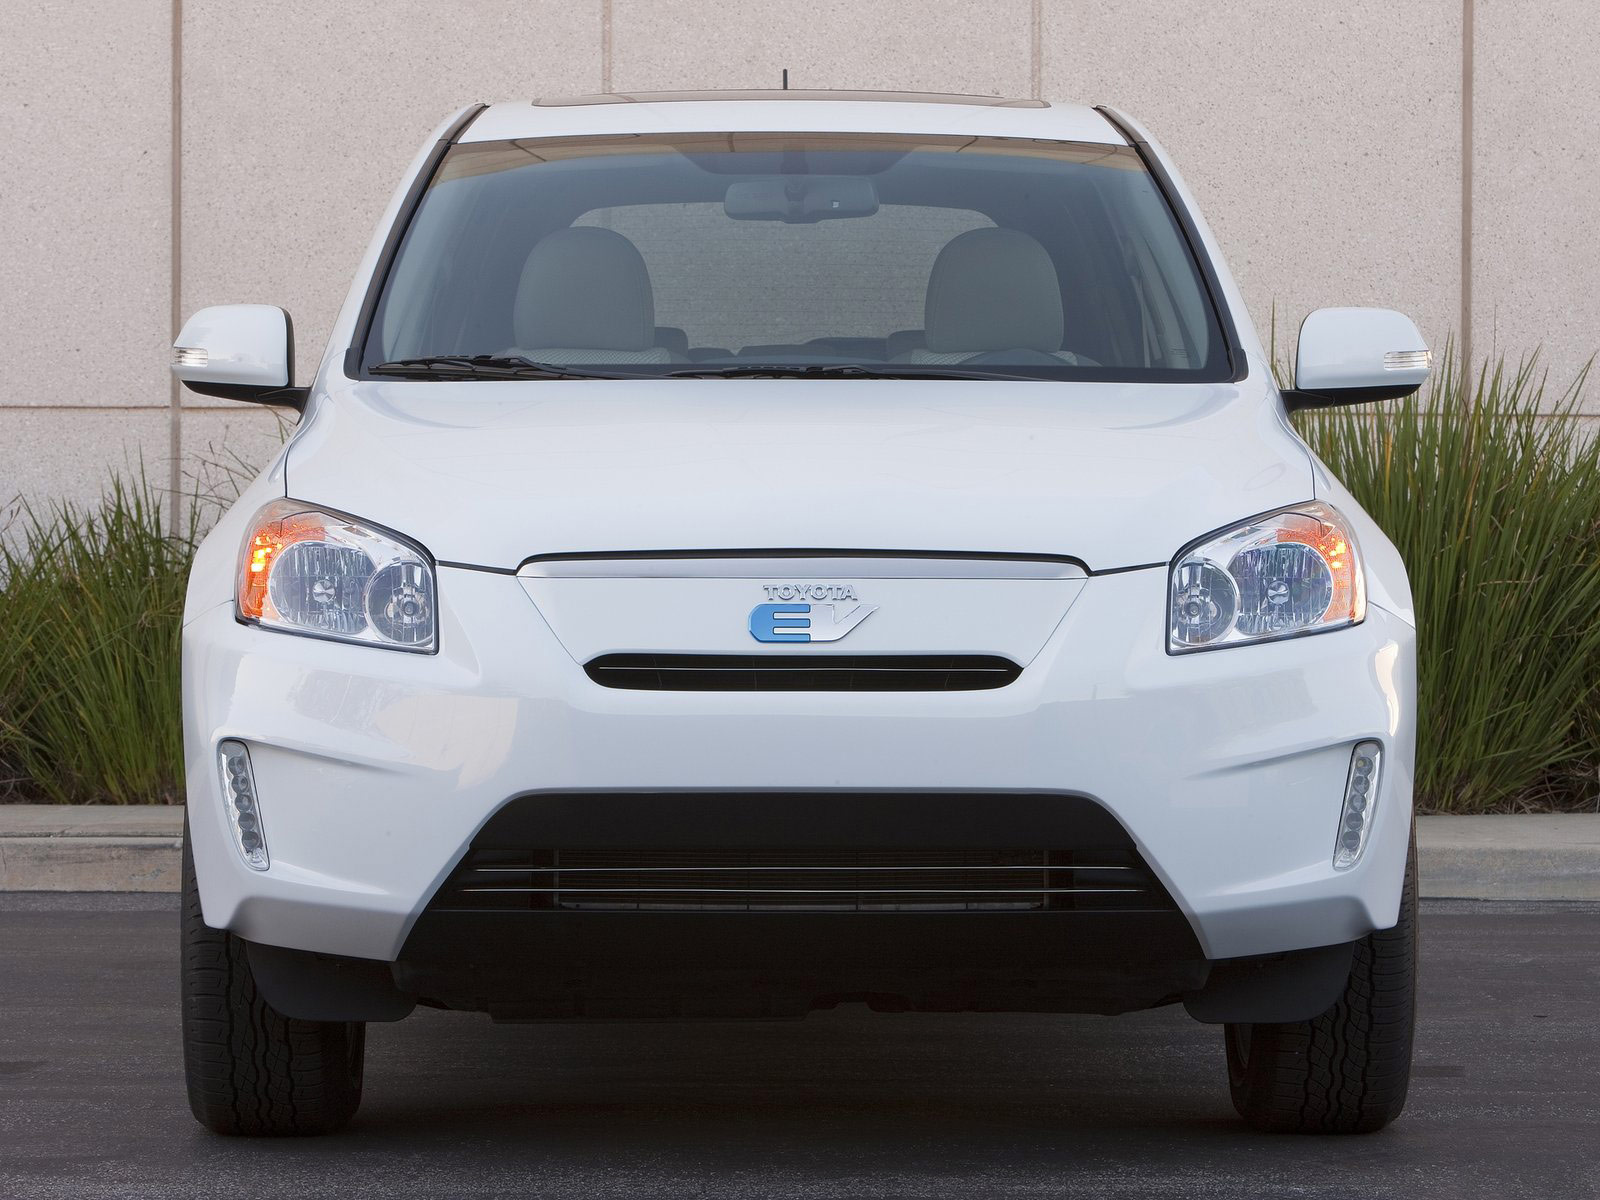 Gambar mobil TOYOTA RAV4 EV Concept 2010